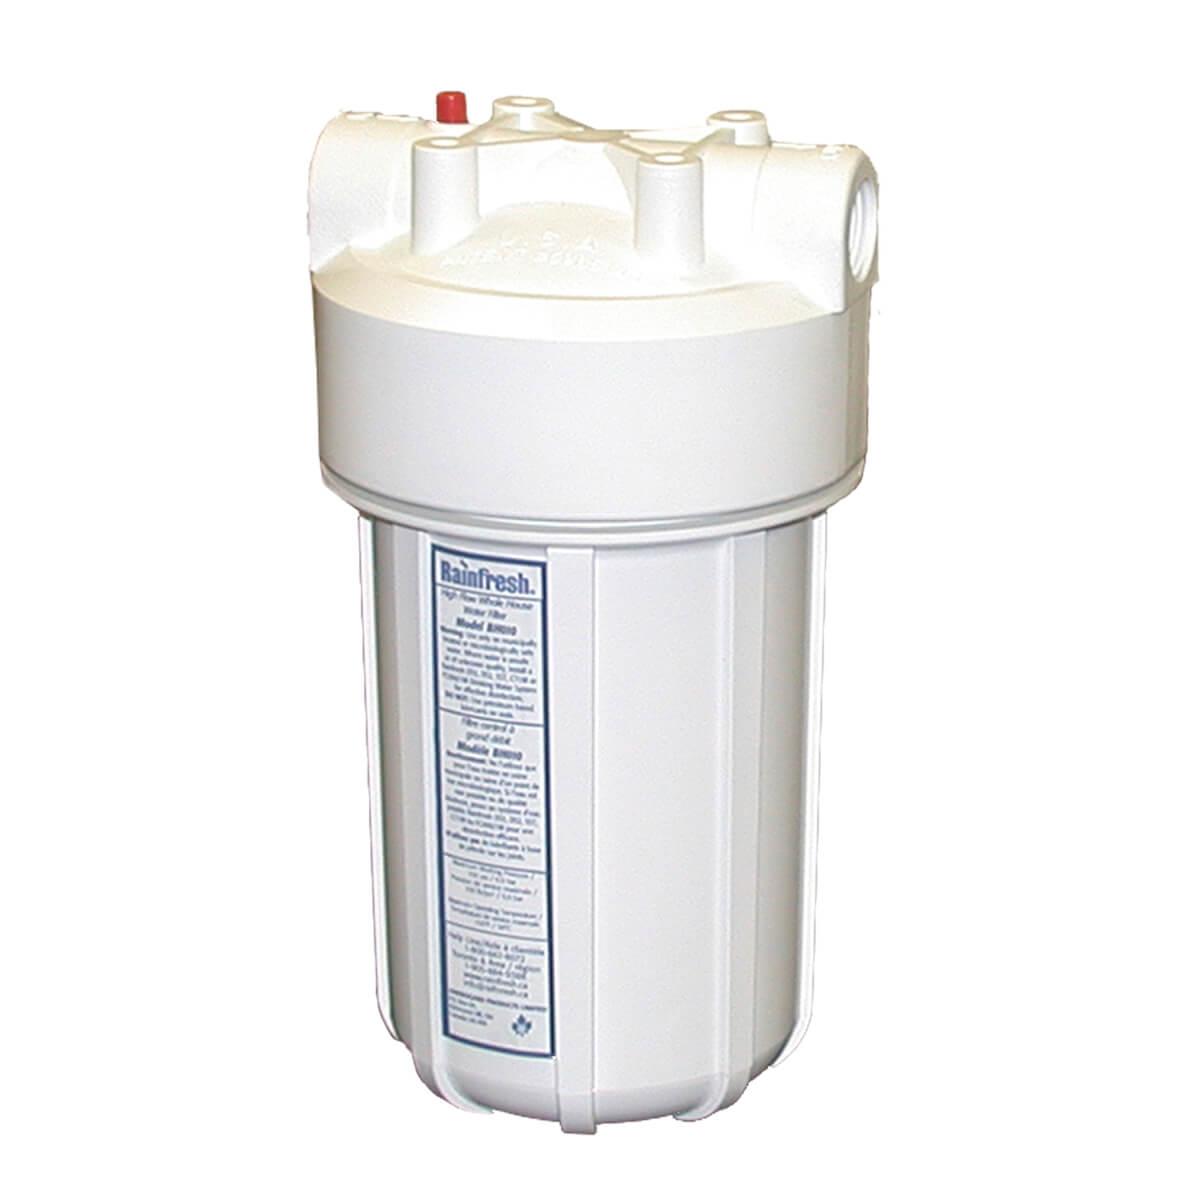 Rainfresh High Flow Whole House Water Filter  - BH010